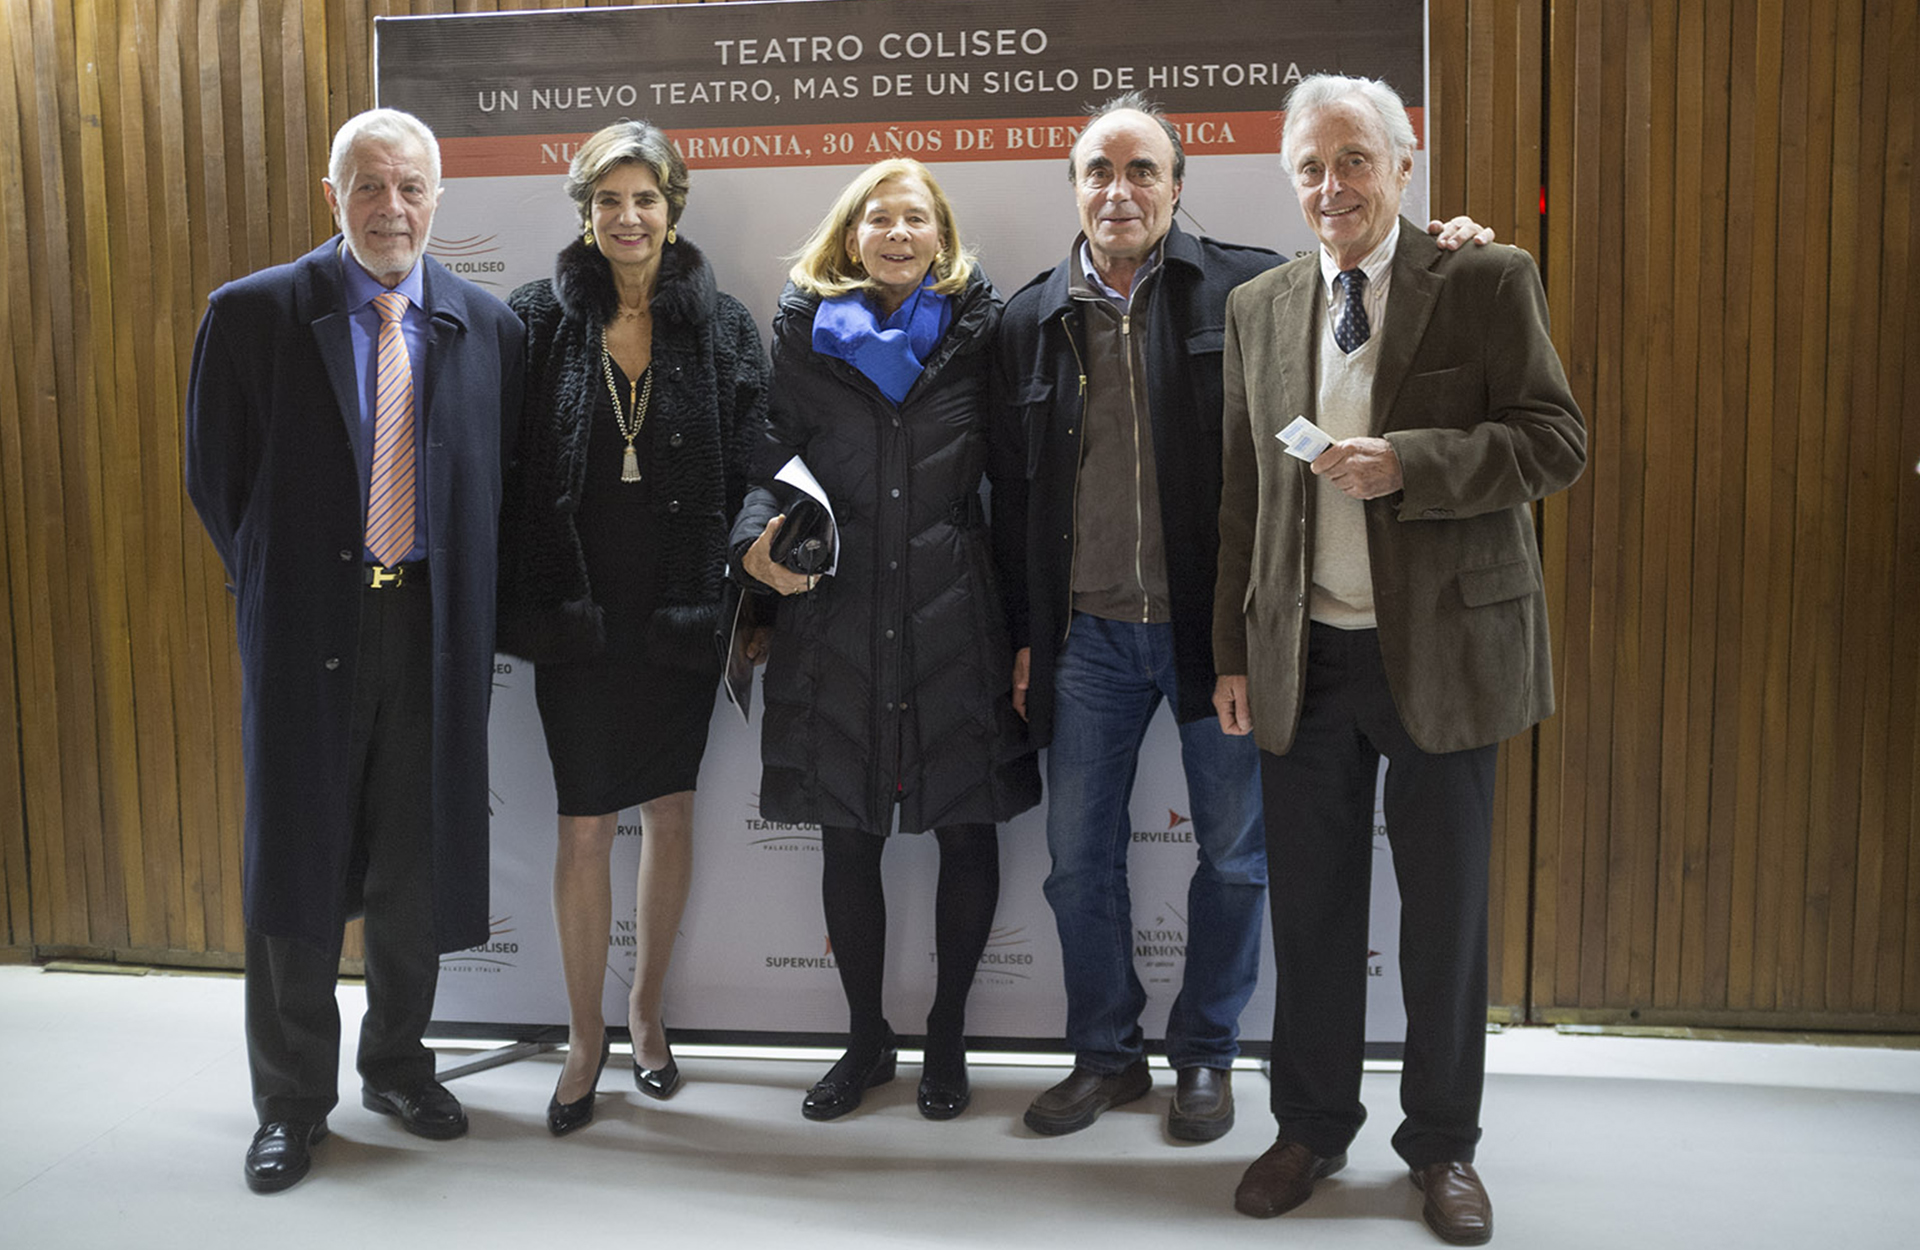 Alejandro Cordero, Fini Travers de Braun, María Eugenia Cordero de Saavedra, Martín Braun y Ricardo Braun Lasala